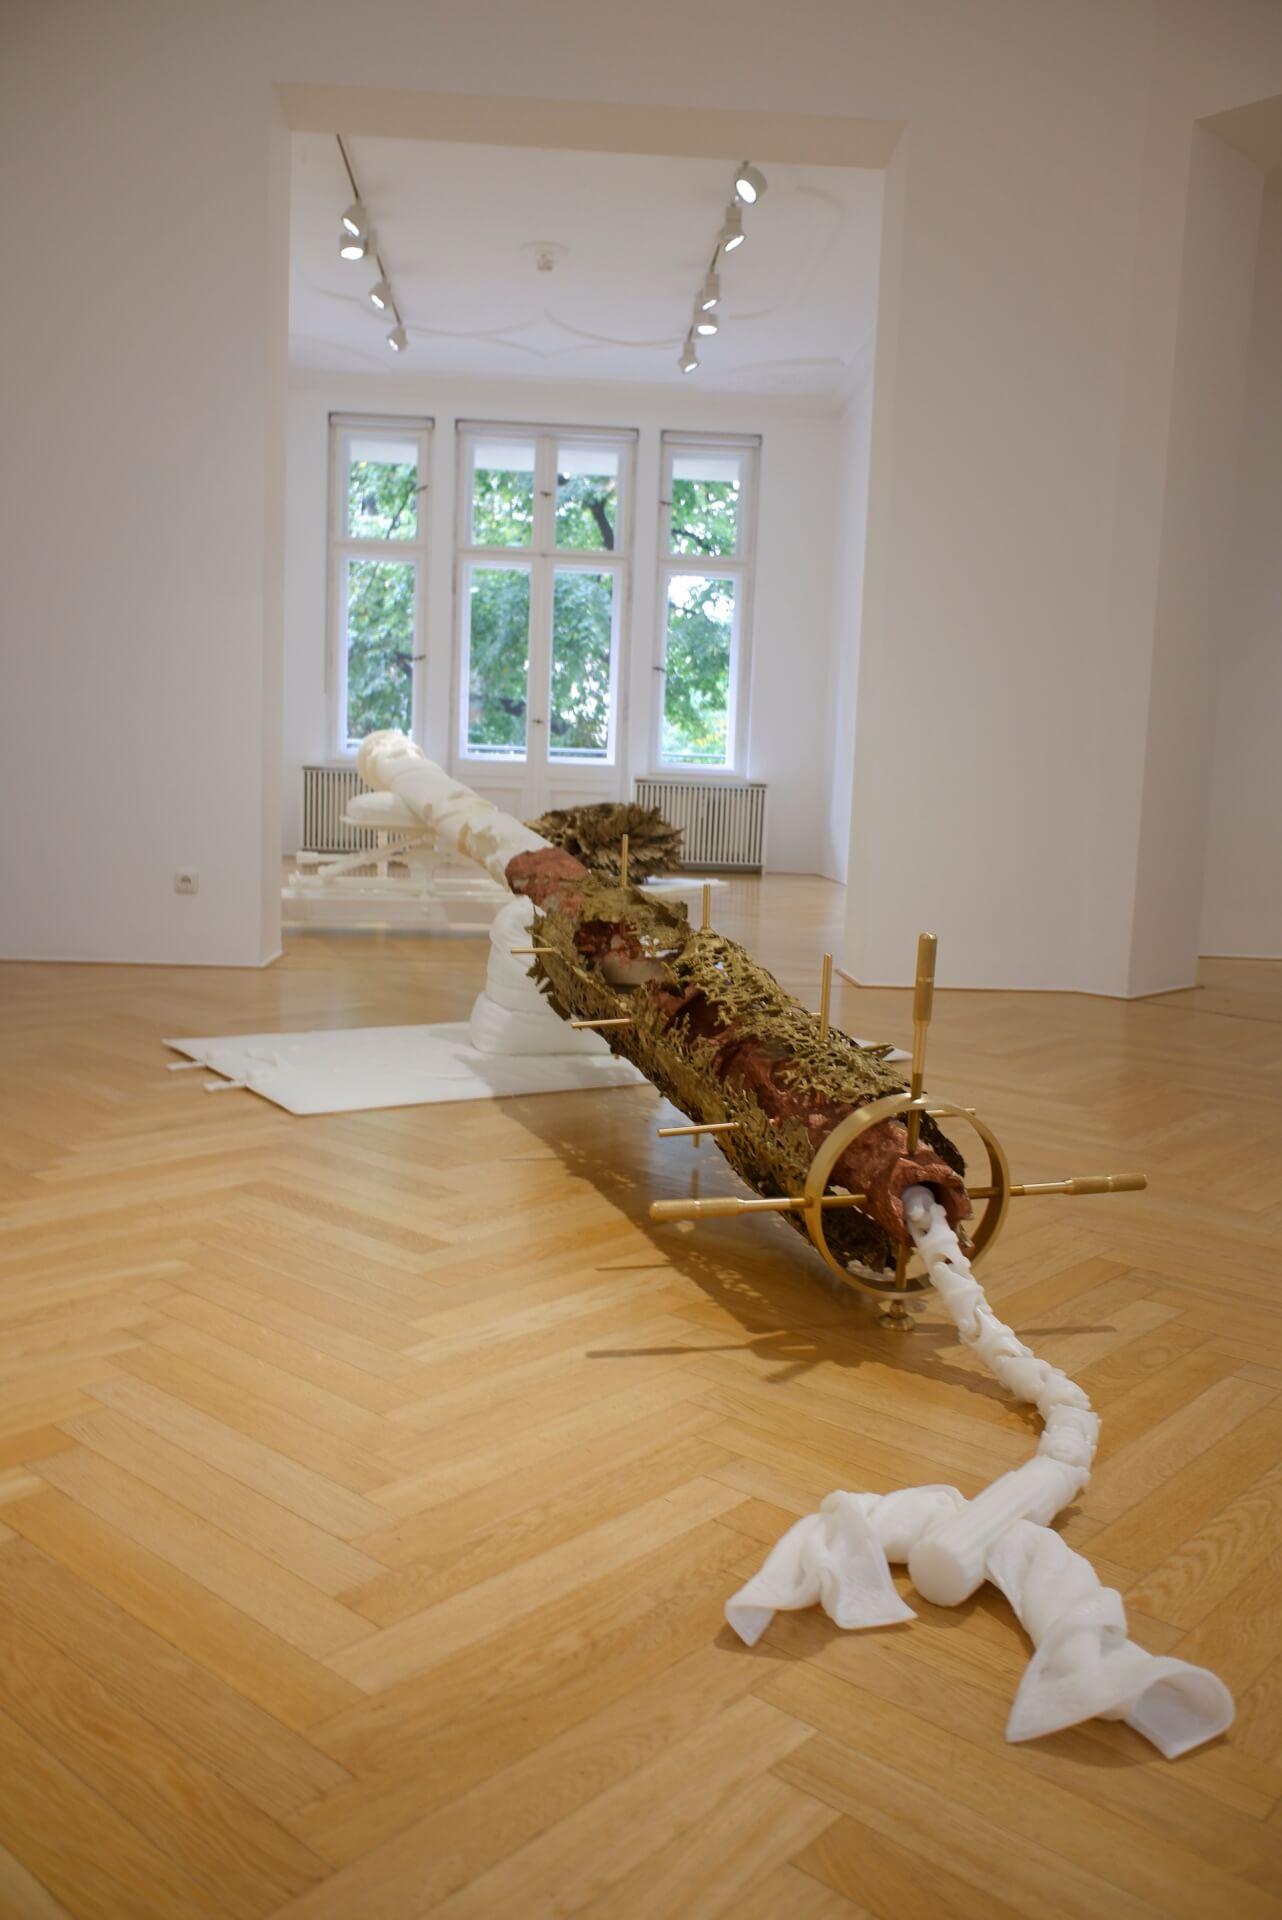 『Berlin Art Week』現地レポート 進化し変化し続けるベルリンのアートカルチャー column210929kana-miyazawa-06